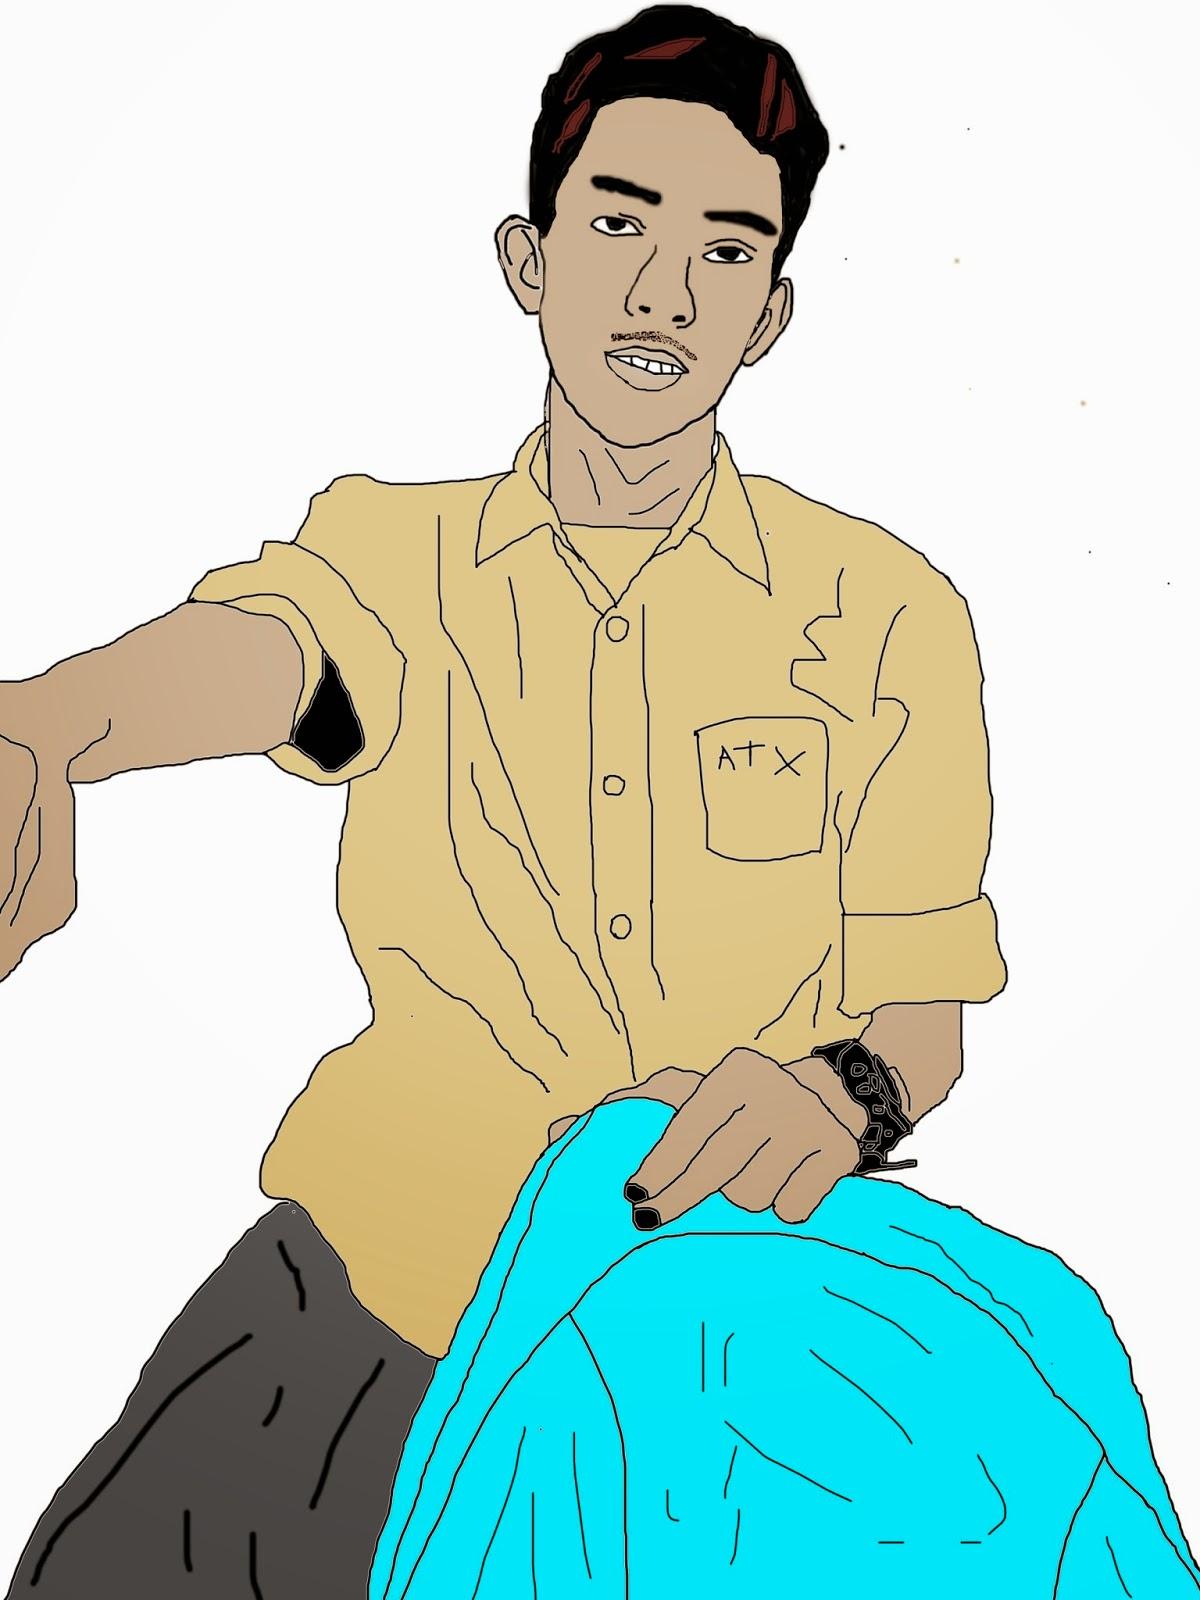 Gambar Kartun Muslim Lelaki Gambar Kartun